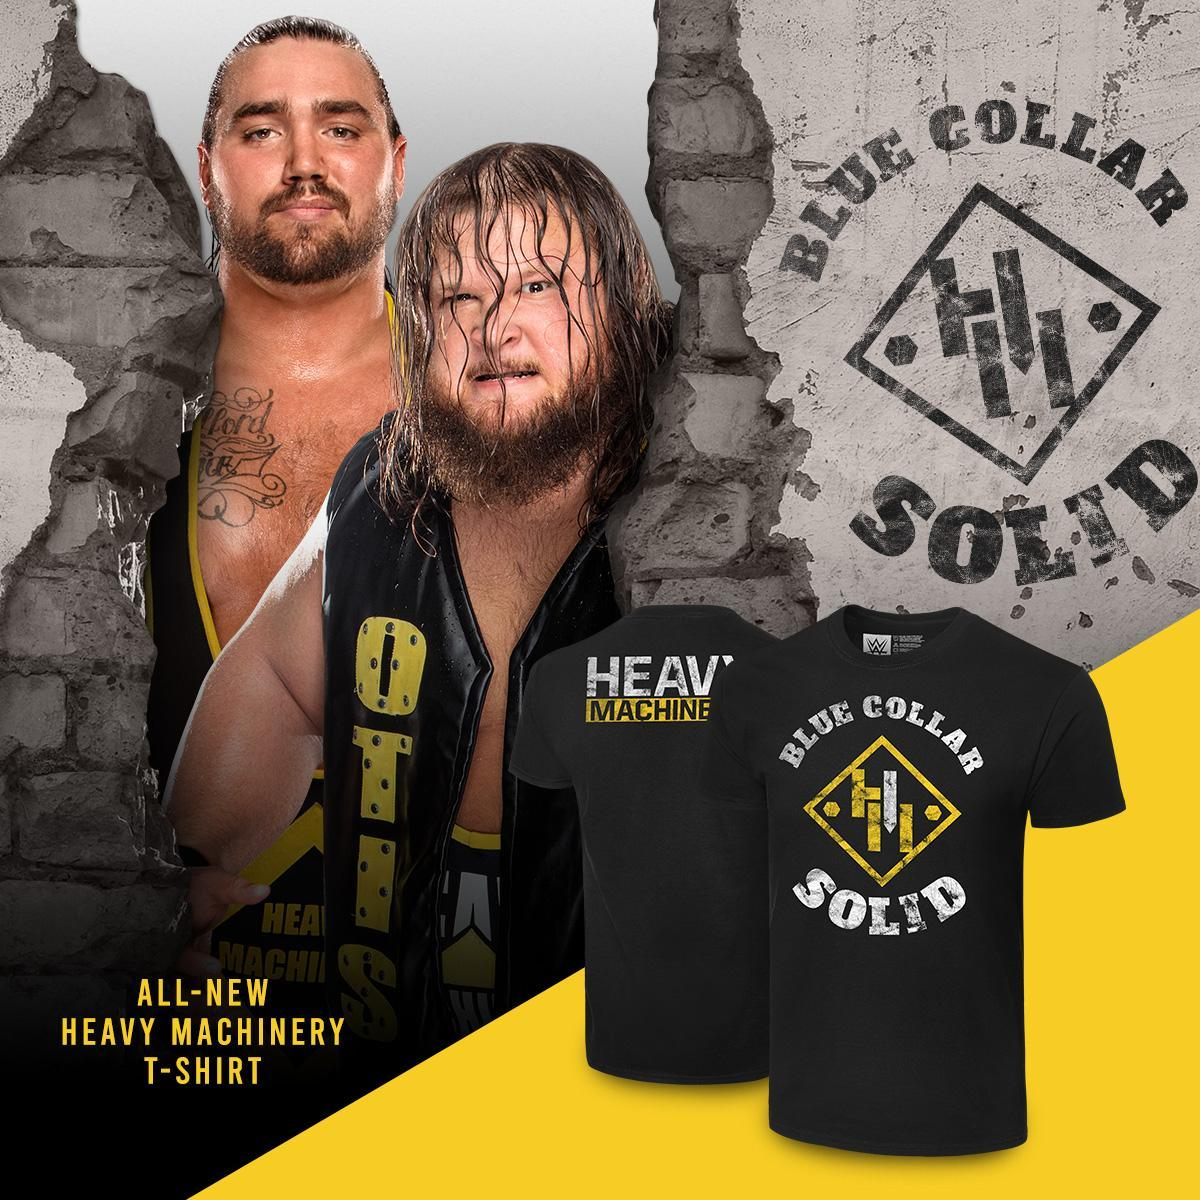 @WWEShop's photo on Heavy Machinery